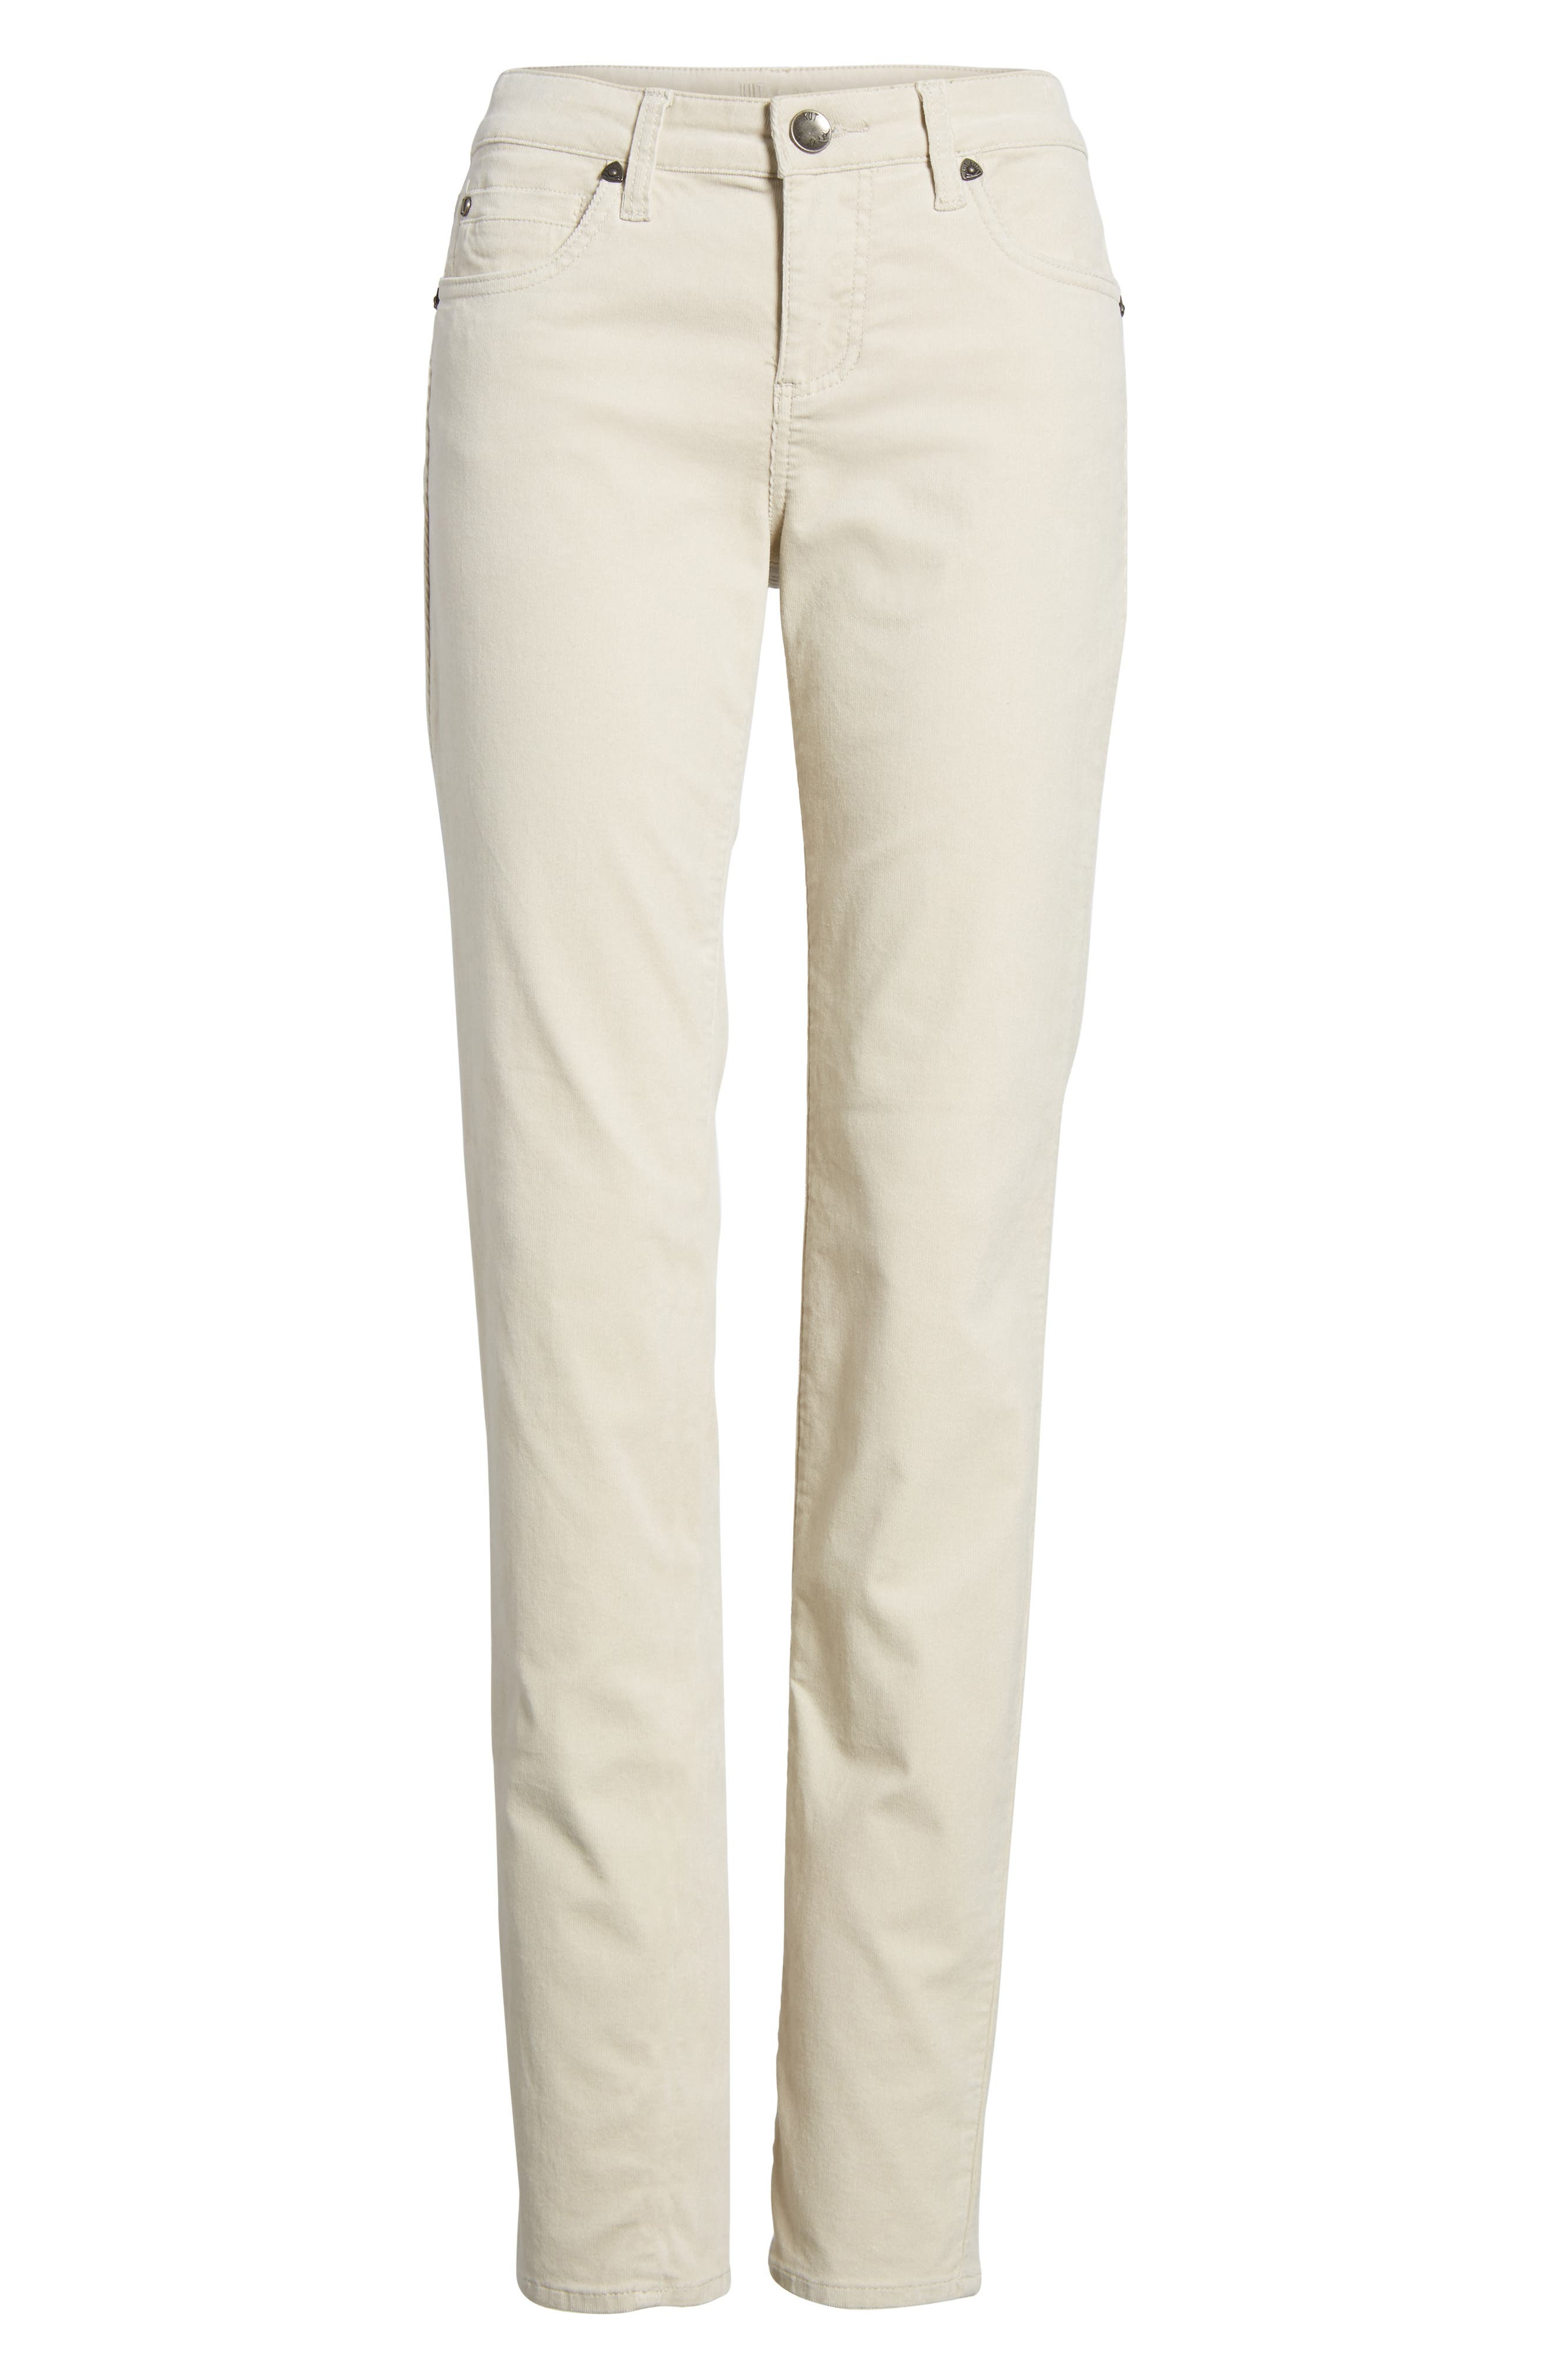 Diana Stretch Corduroy Skinny Pants,                             Alternate thumbnail 6, color,                             Light Tan 2